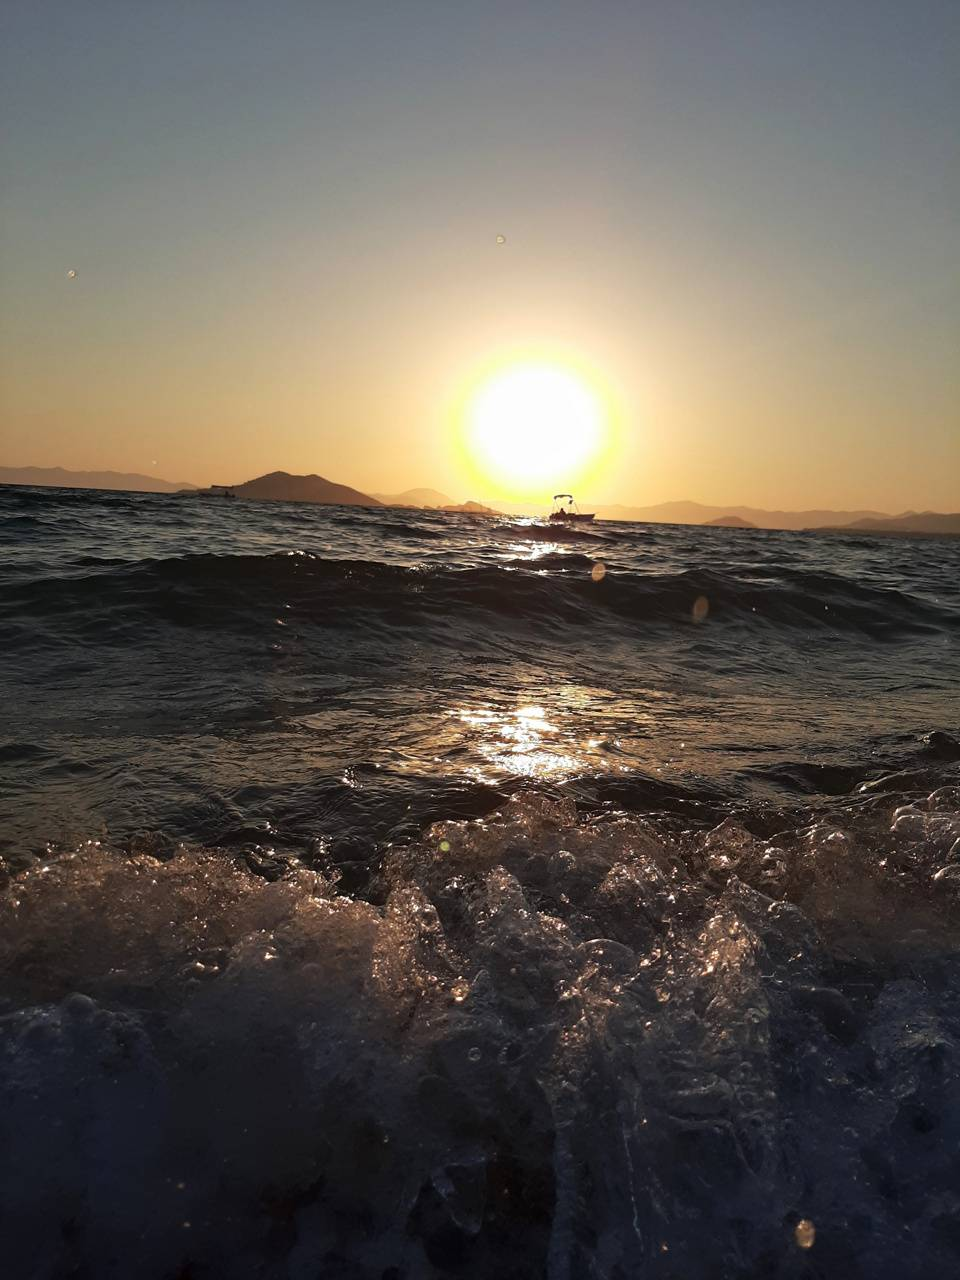 Sea nature sunset